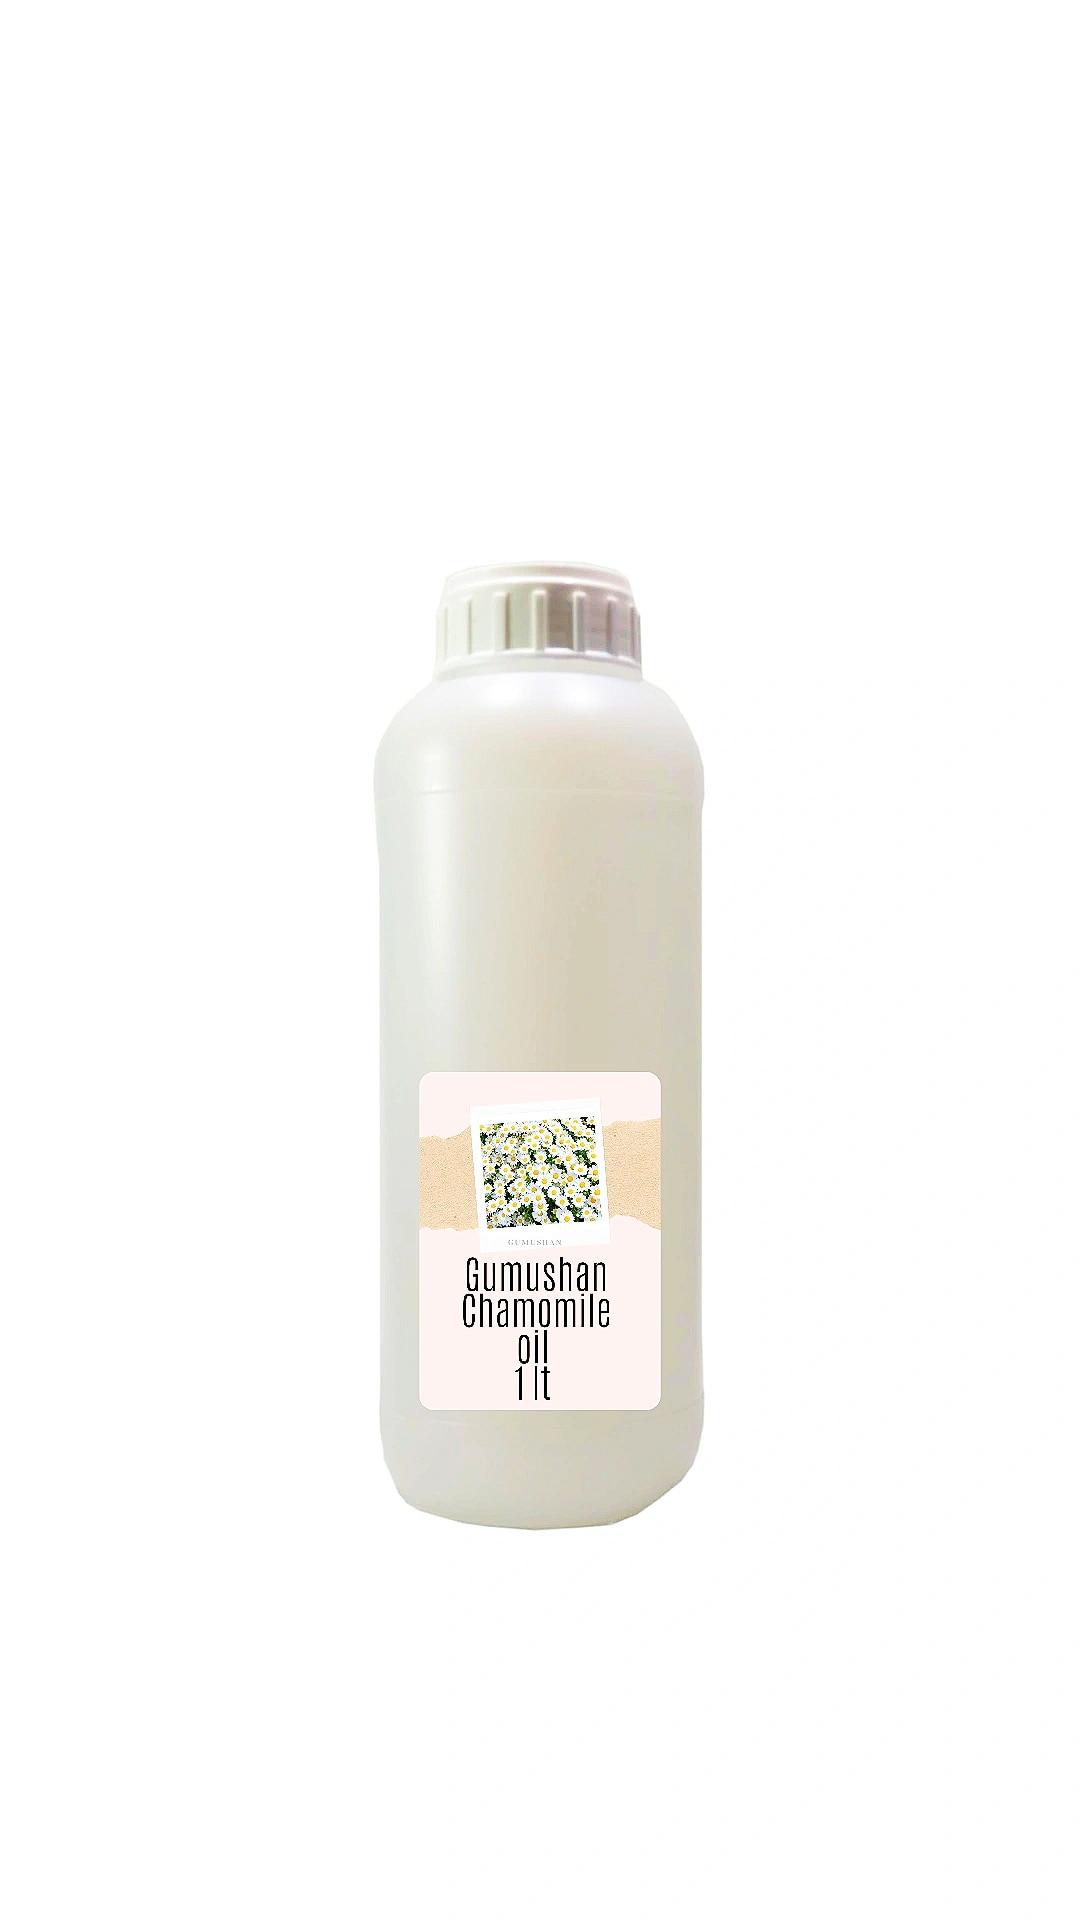 High quality pure Chamomile Oil 1 liter 34 fl oz 1000ml